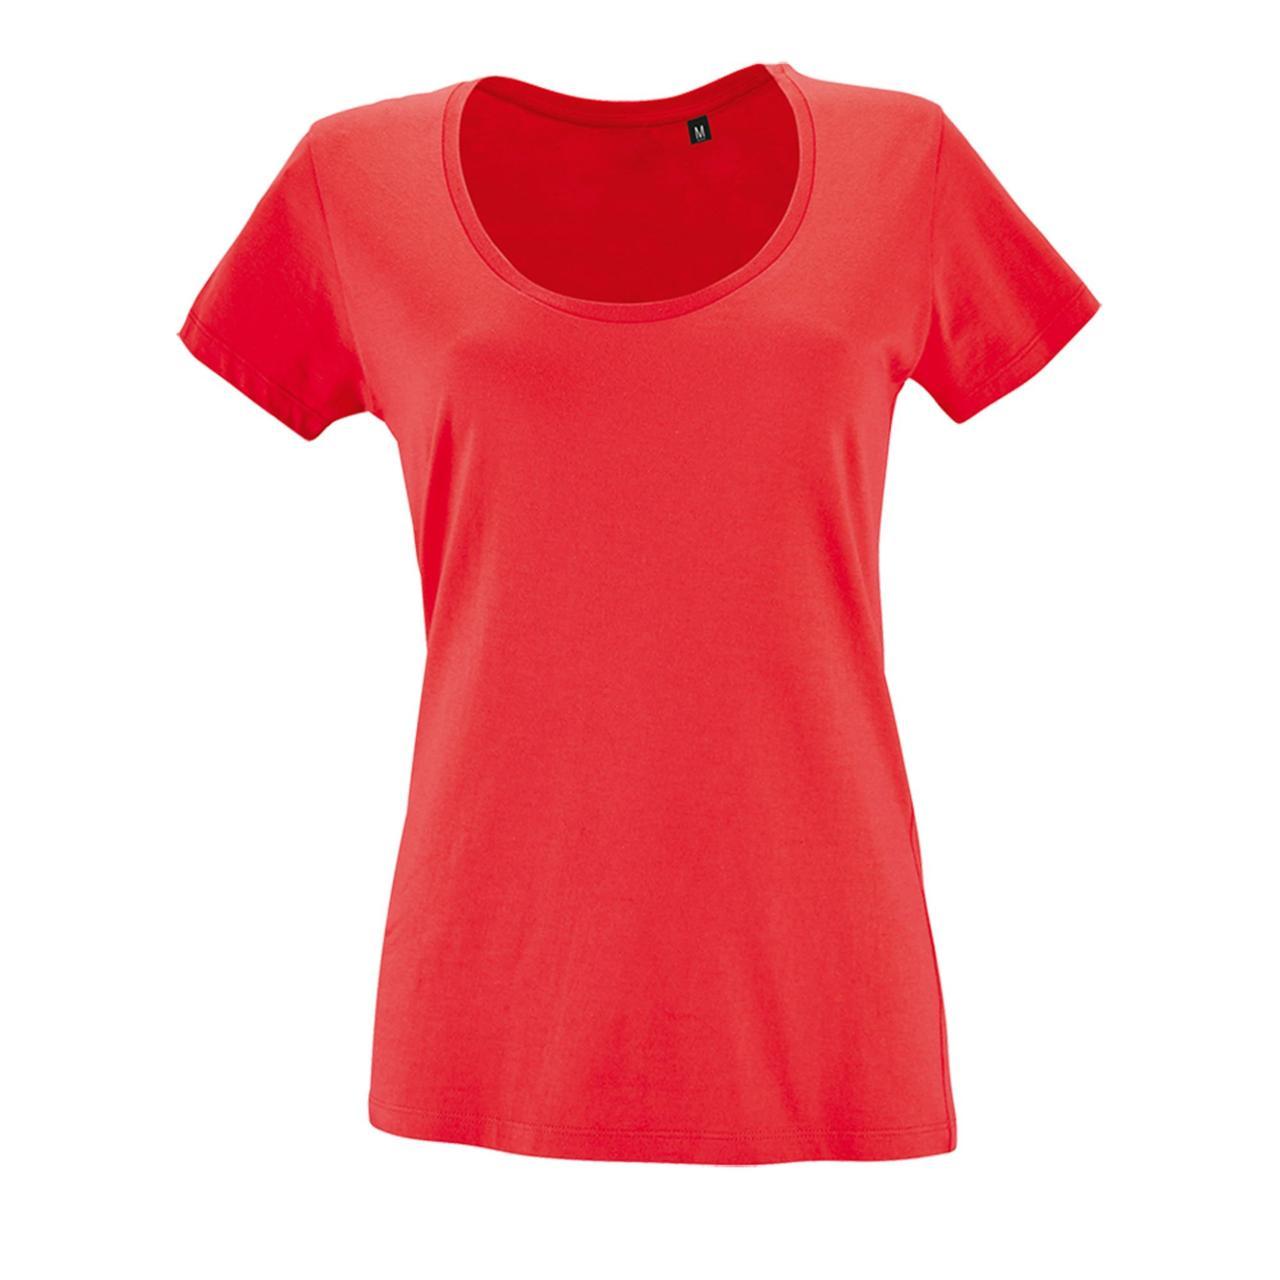 Футболка женская Metropolitan, розовая (коралловая) (артикул 02079168)